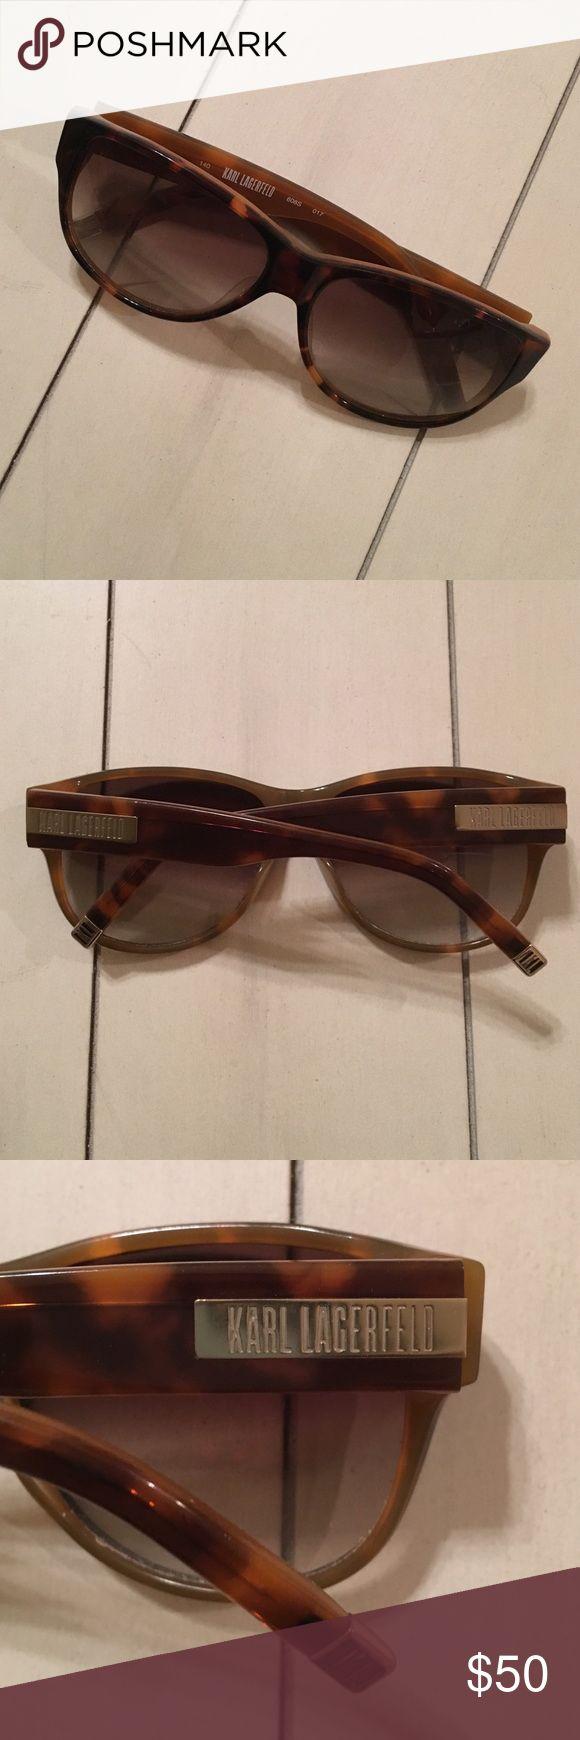 Karl Lagerfeld tortoise shell sunglasses Karl Lagerfeld tortoise shell sunglasses Karl Lagerfeld Accessories Sunglasses